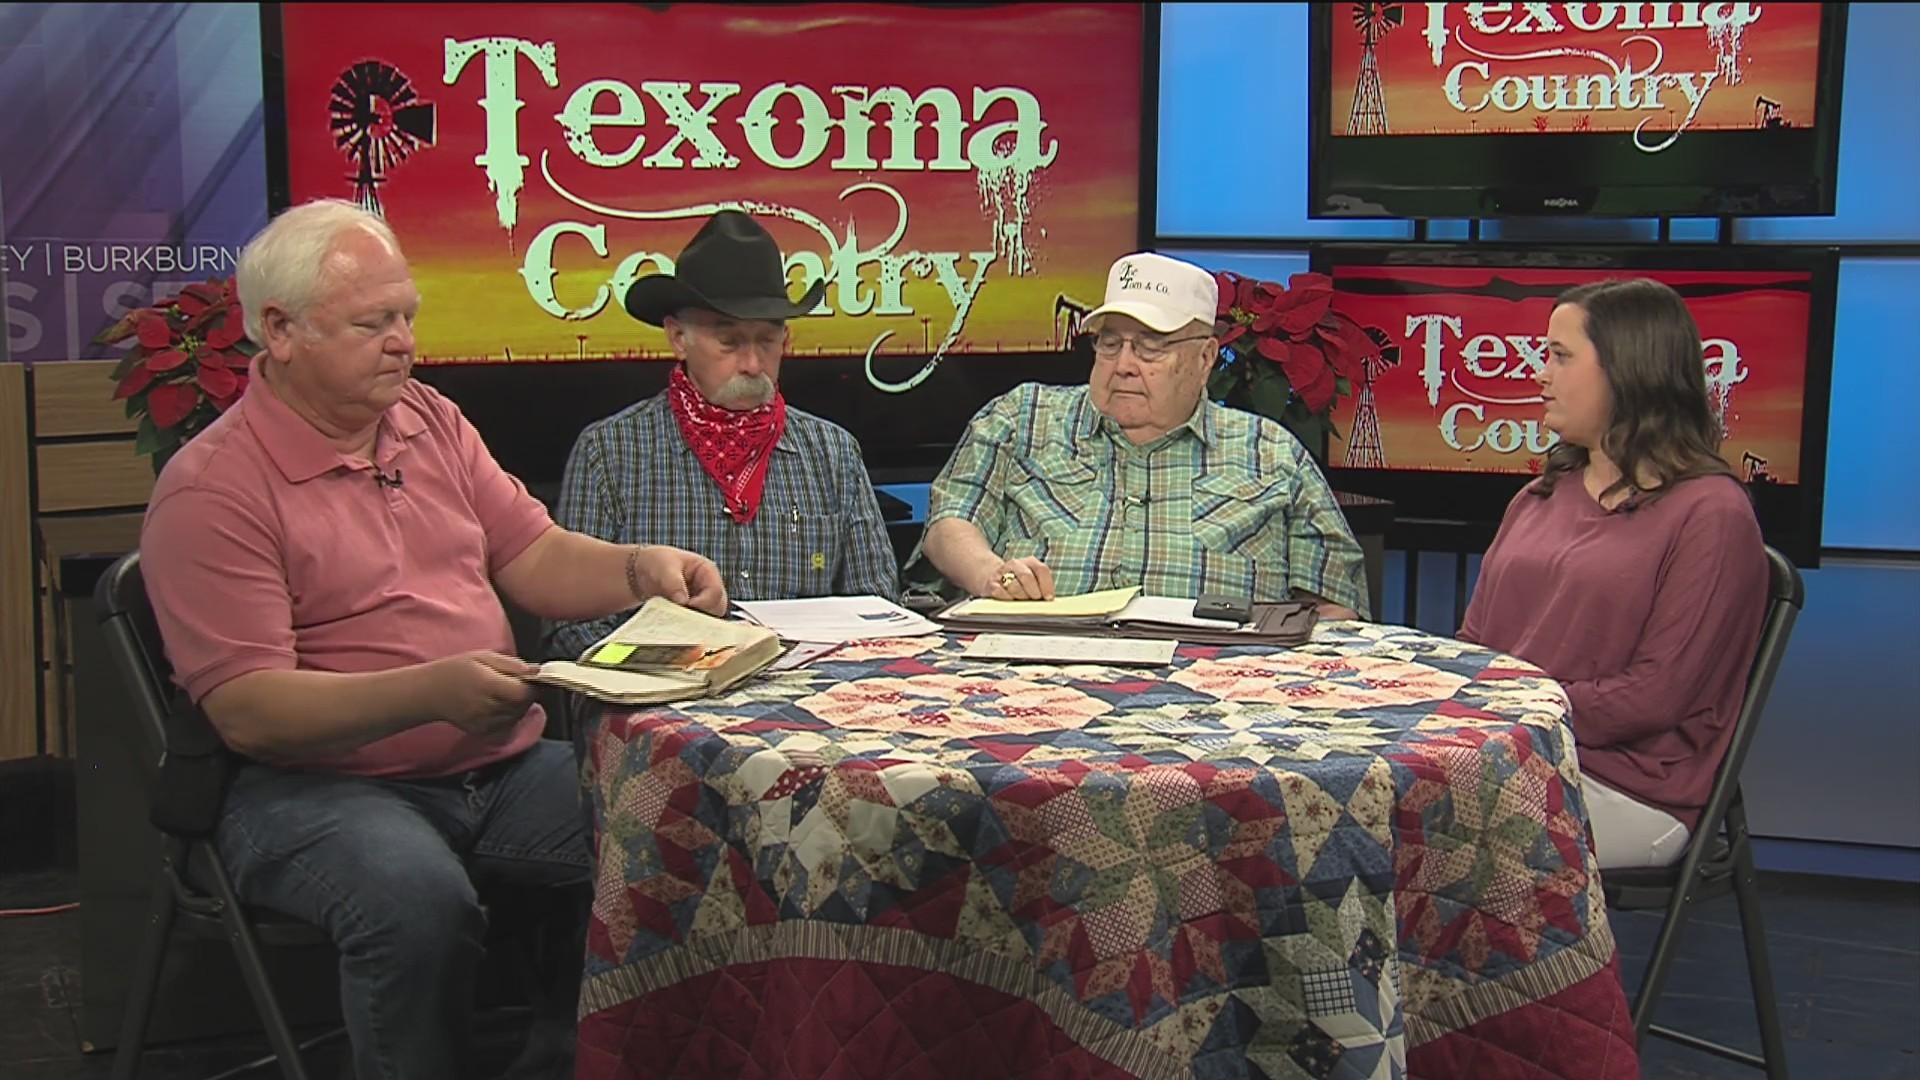 Texoma Country Morning 11/30/18 4